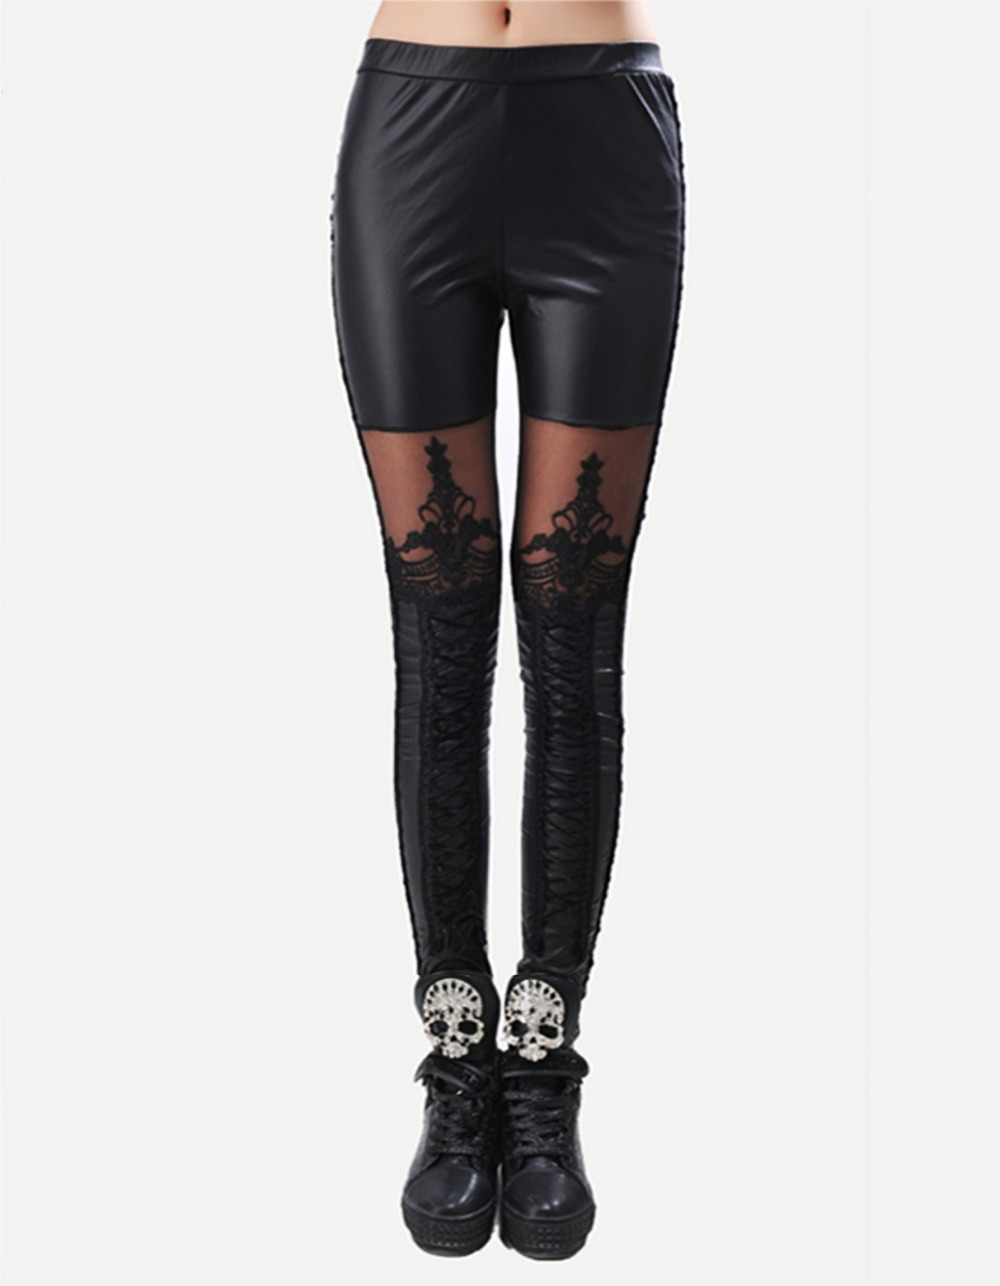 Black Legins Punk Gothic Fashion Women Leggings Sexy PU Leather Stitching Embroidery Hollow Lace Legging For Women Leggins 15 5